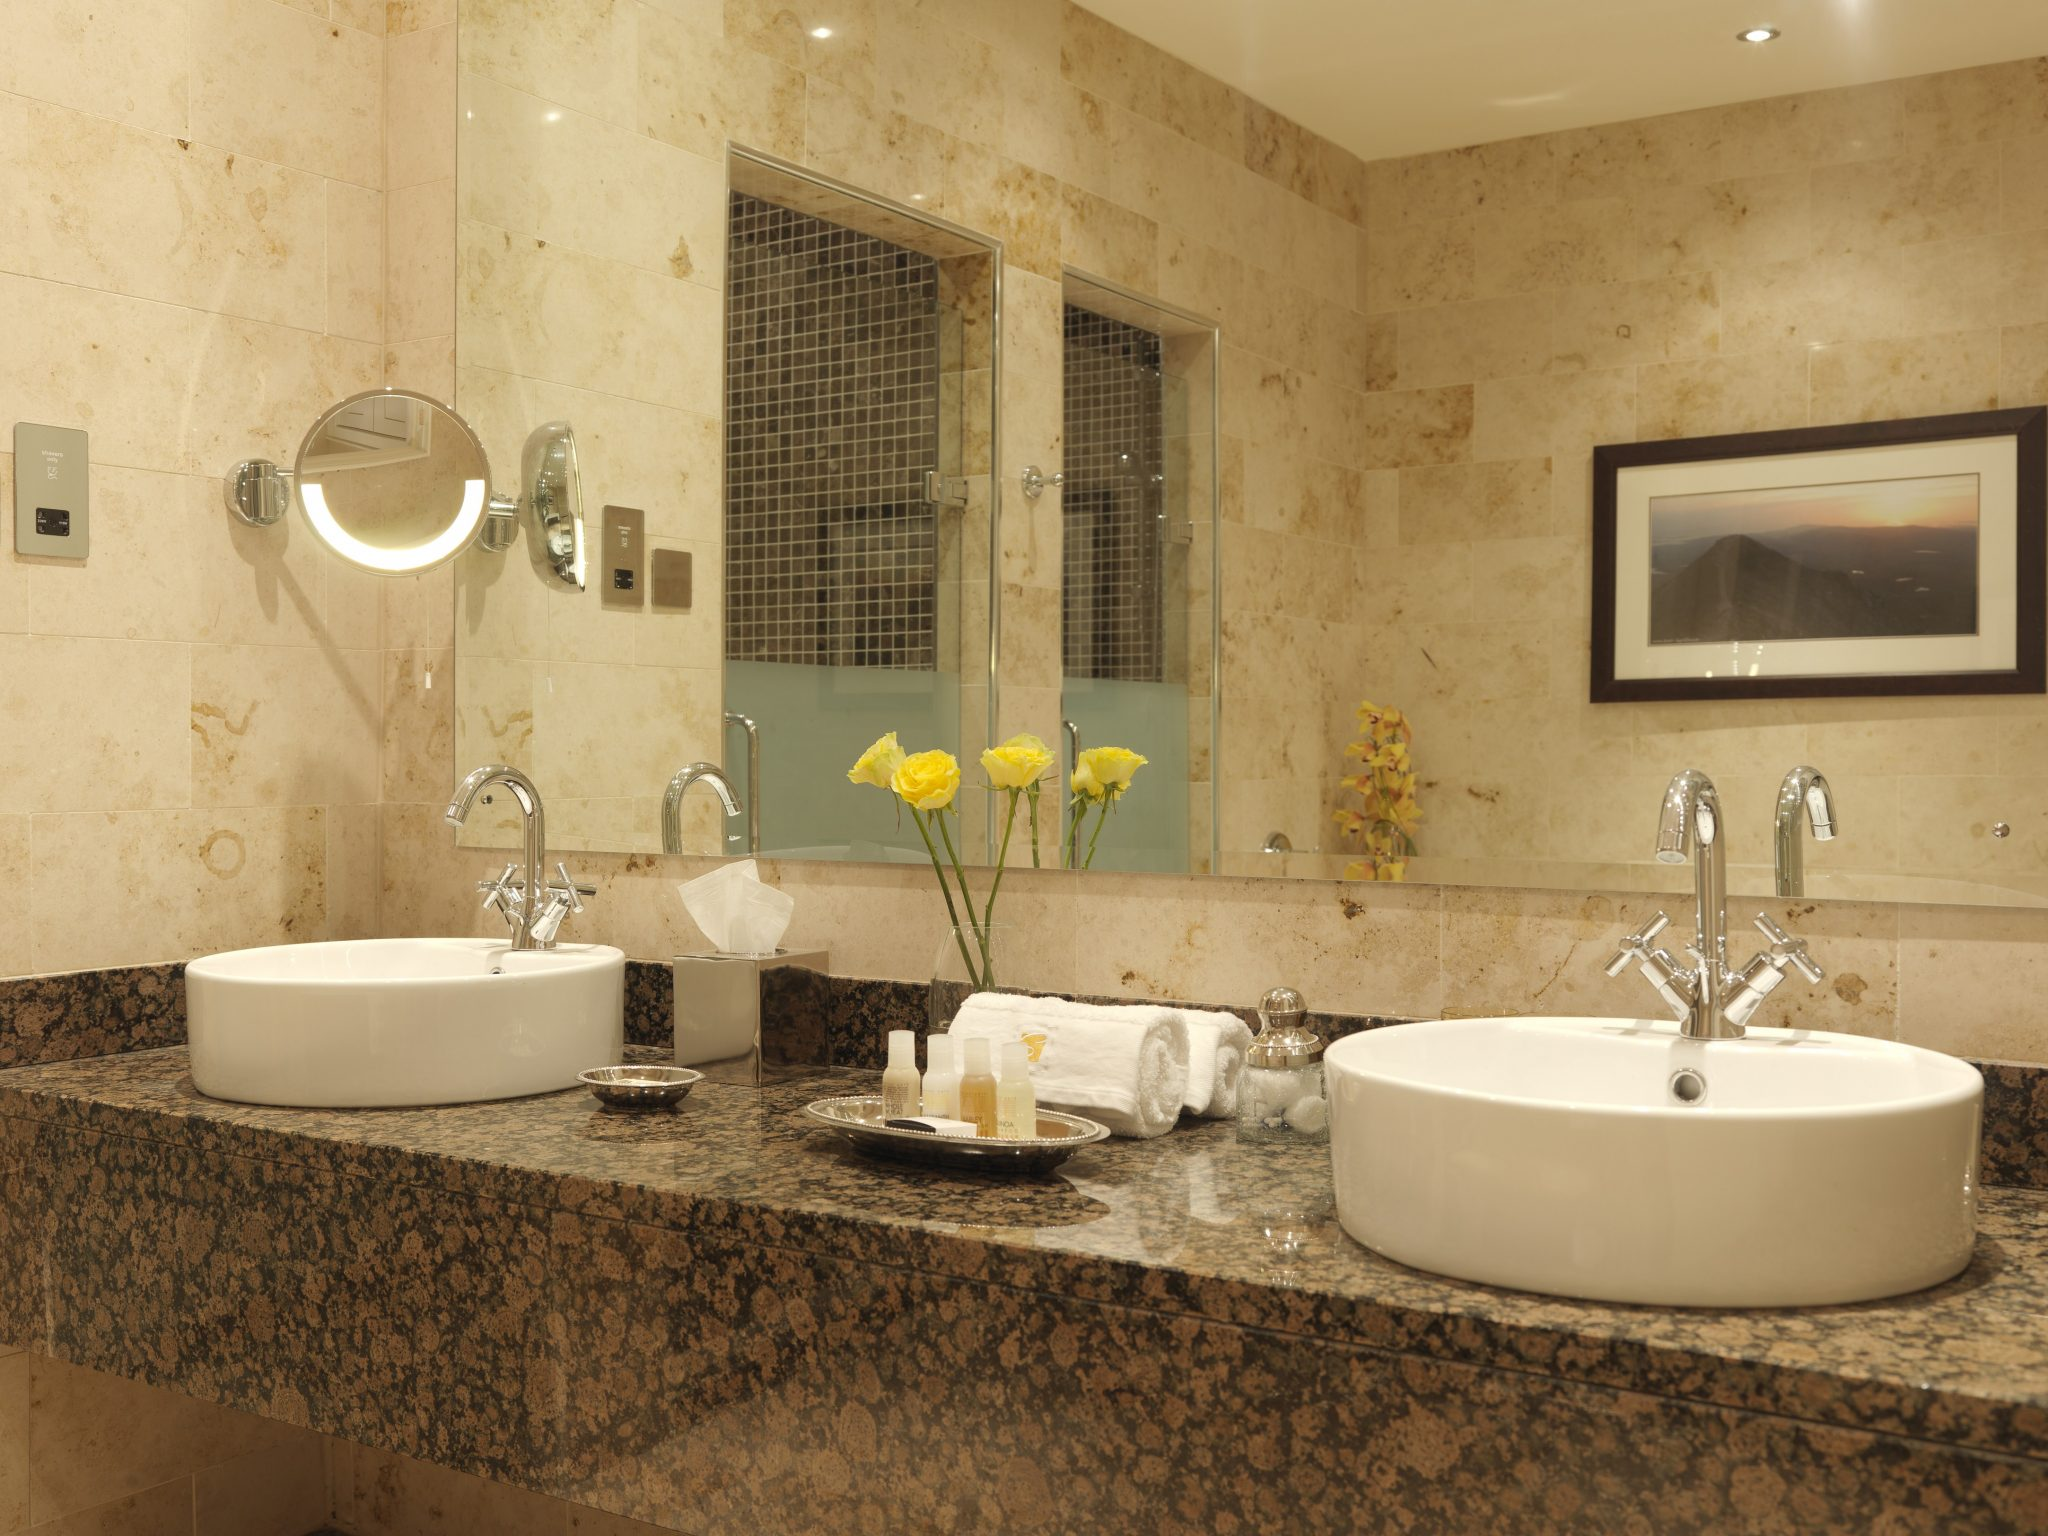 Bathroom at the amazing solis lough eske castle ireland